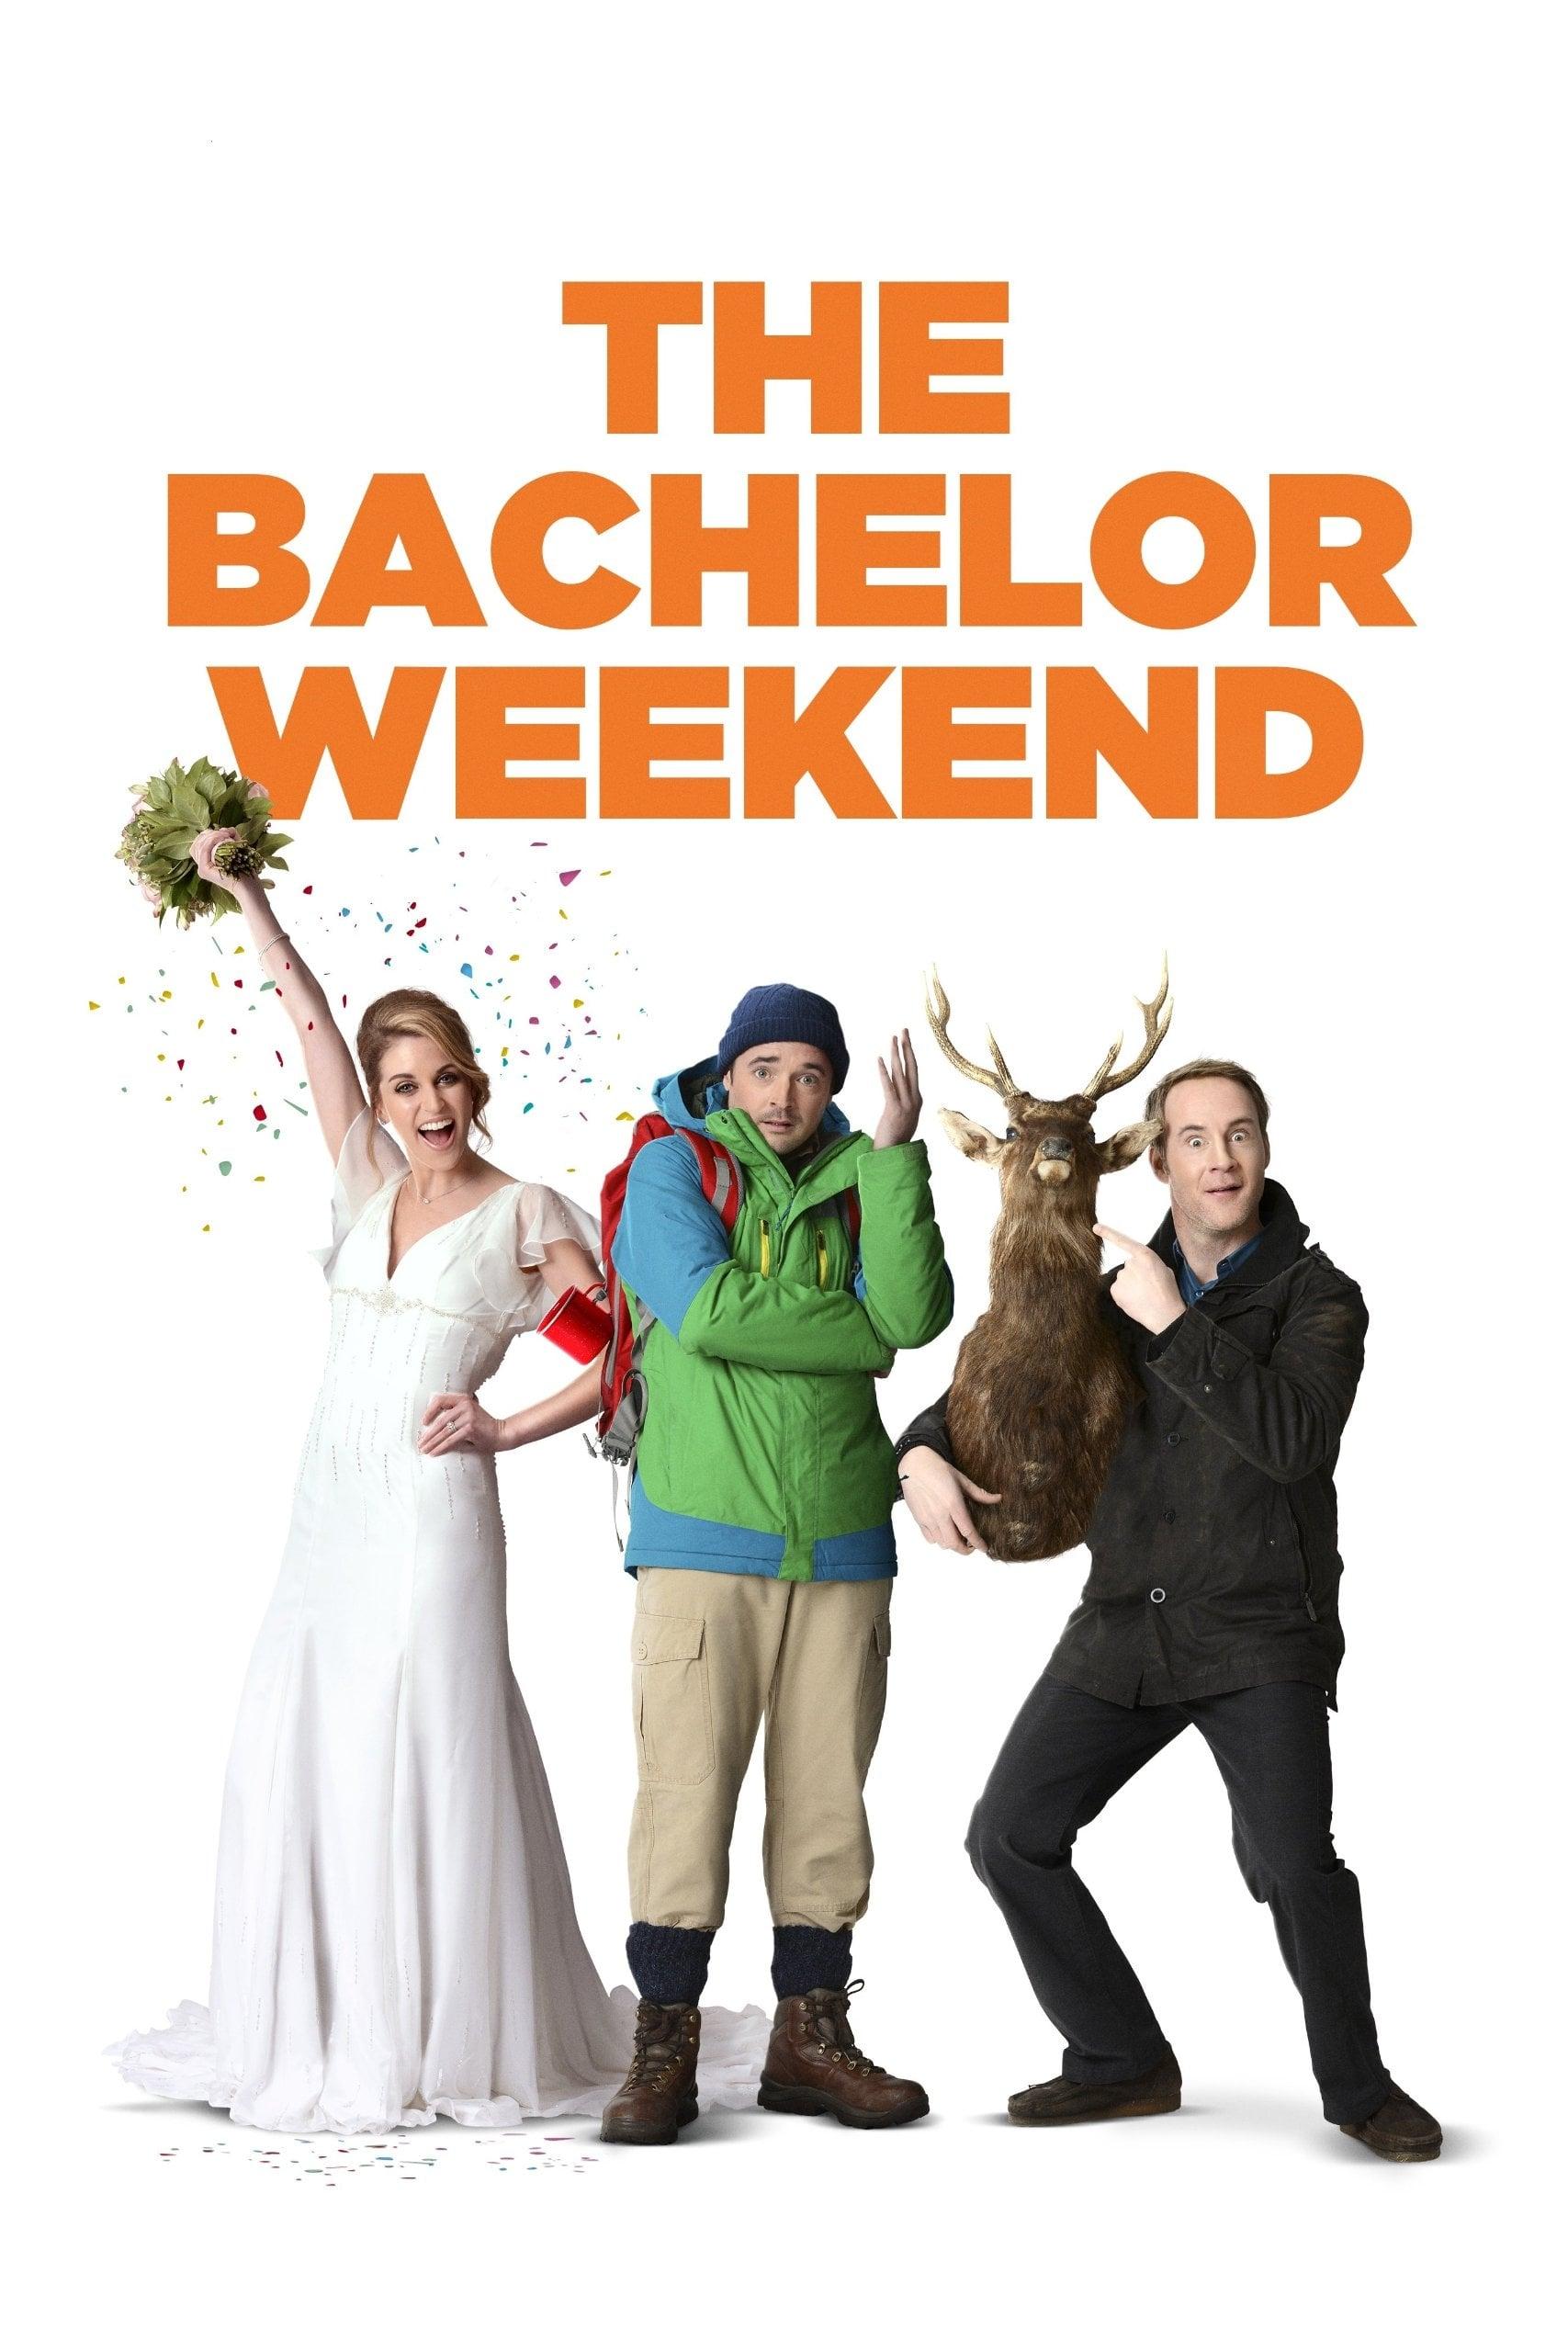 The Bachelor Weekend on FREECABLE TV